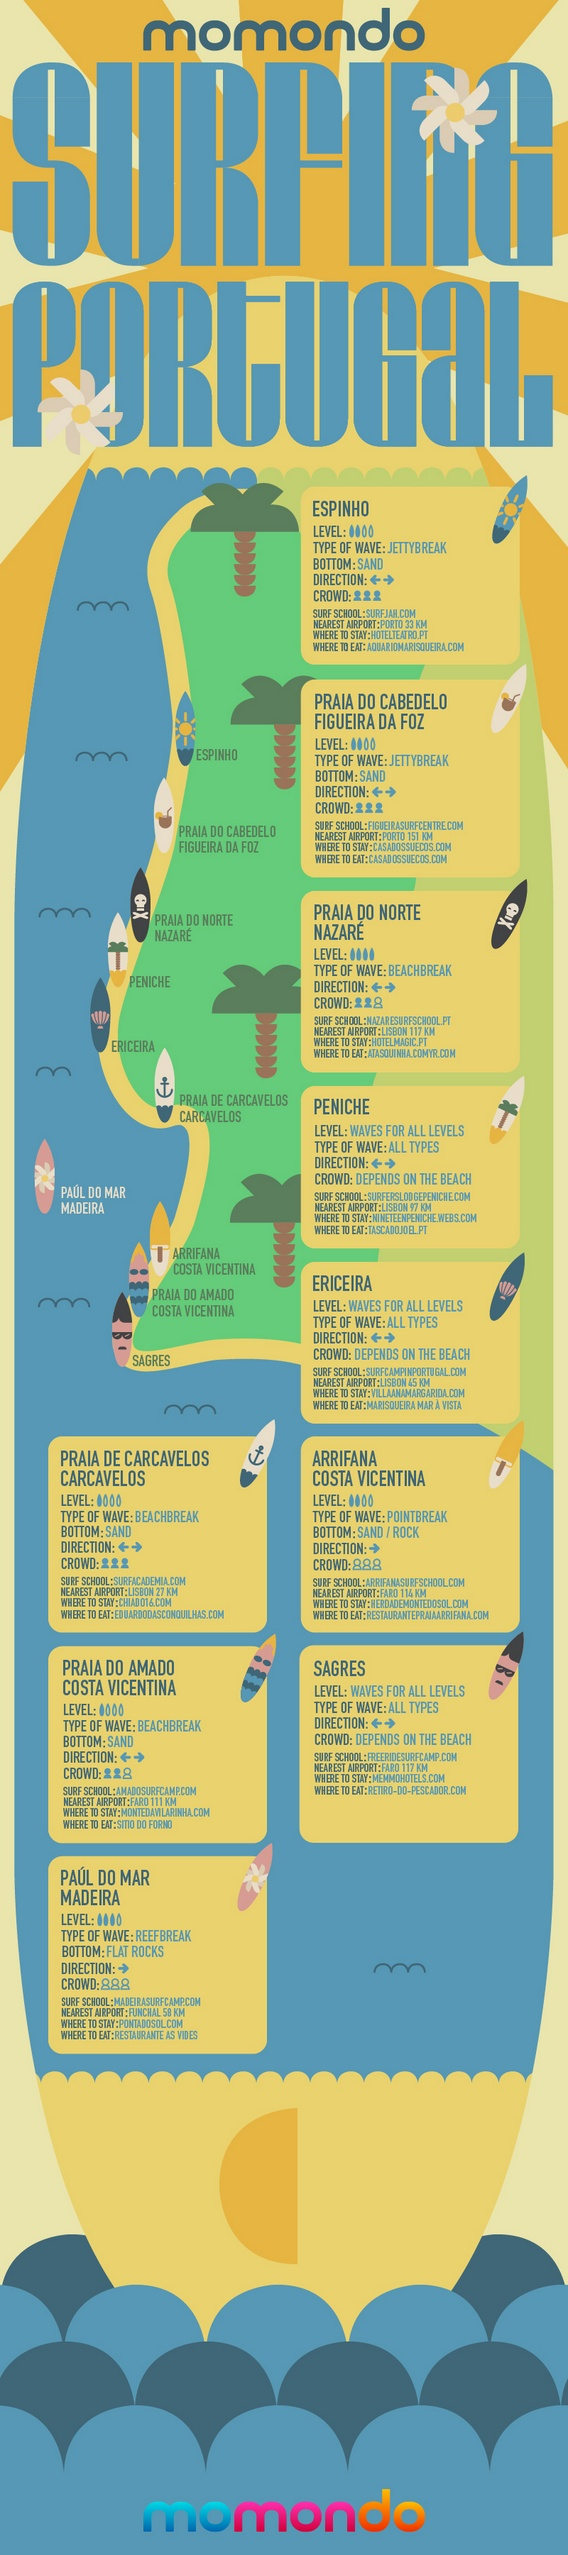 Best Surf Breaks in Portugal